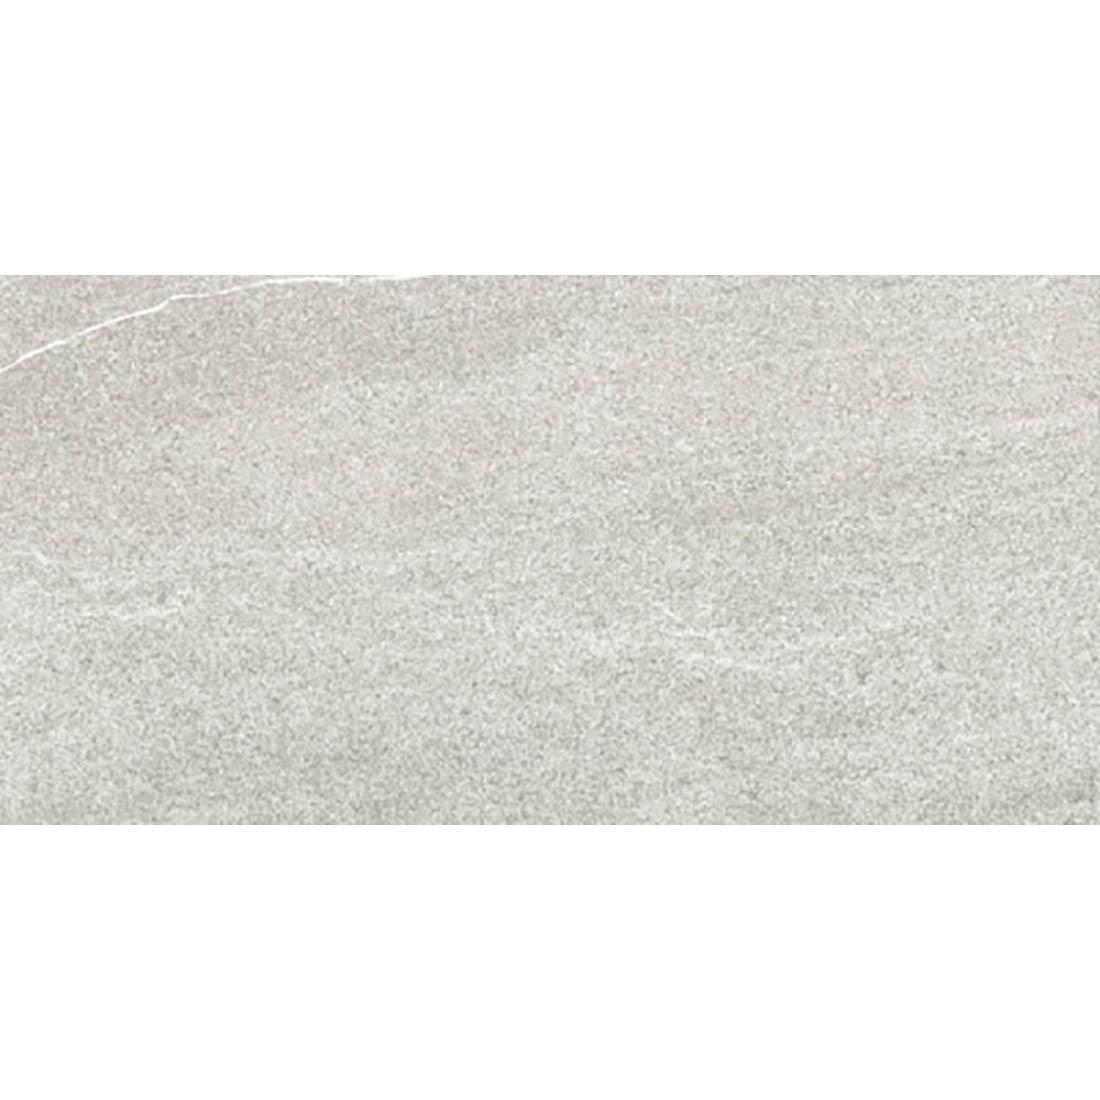 Castellum 30x60 Dark Perla Matt 1